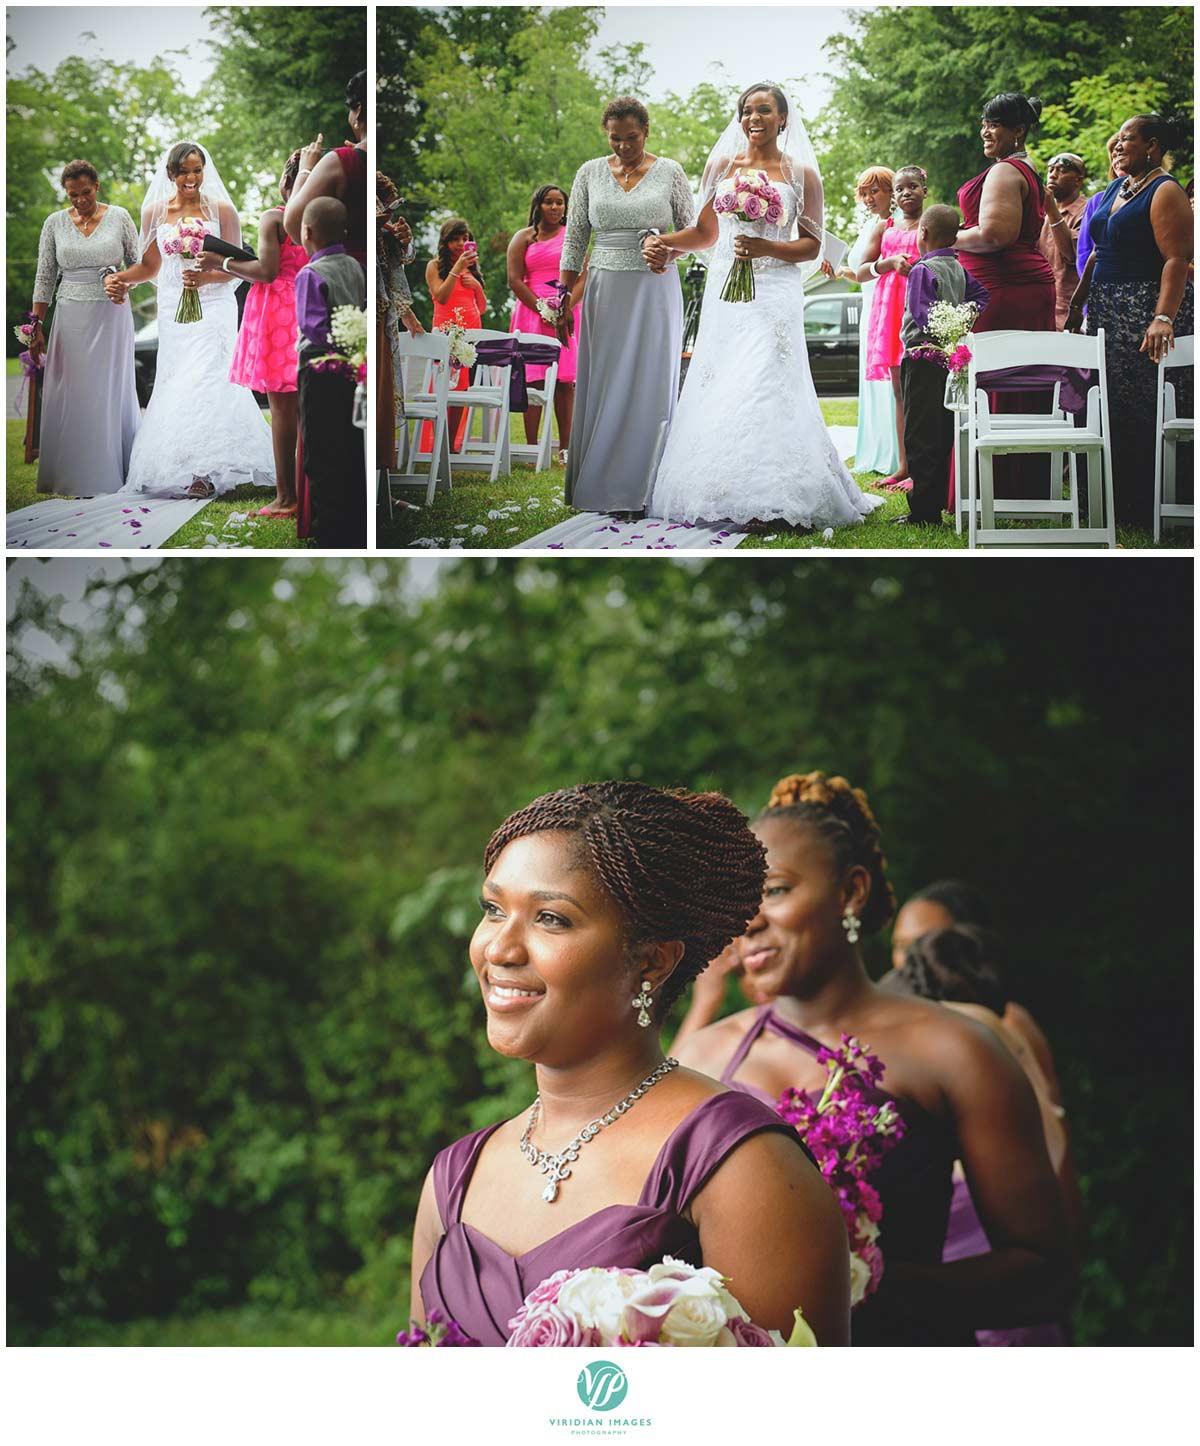 Atlanta-wedding-photographers-ceremony-bride-aisle-interracial-photo-8